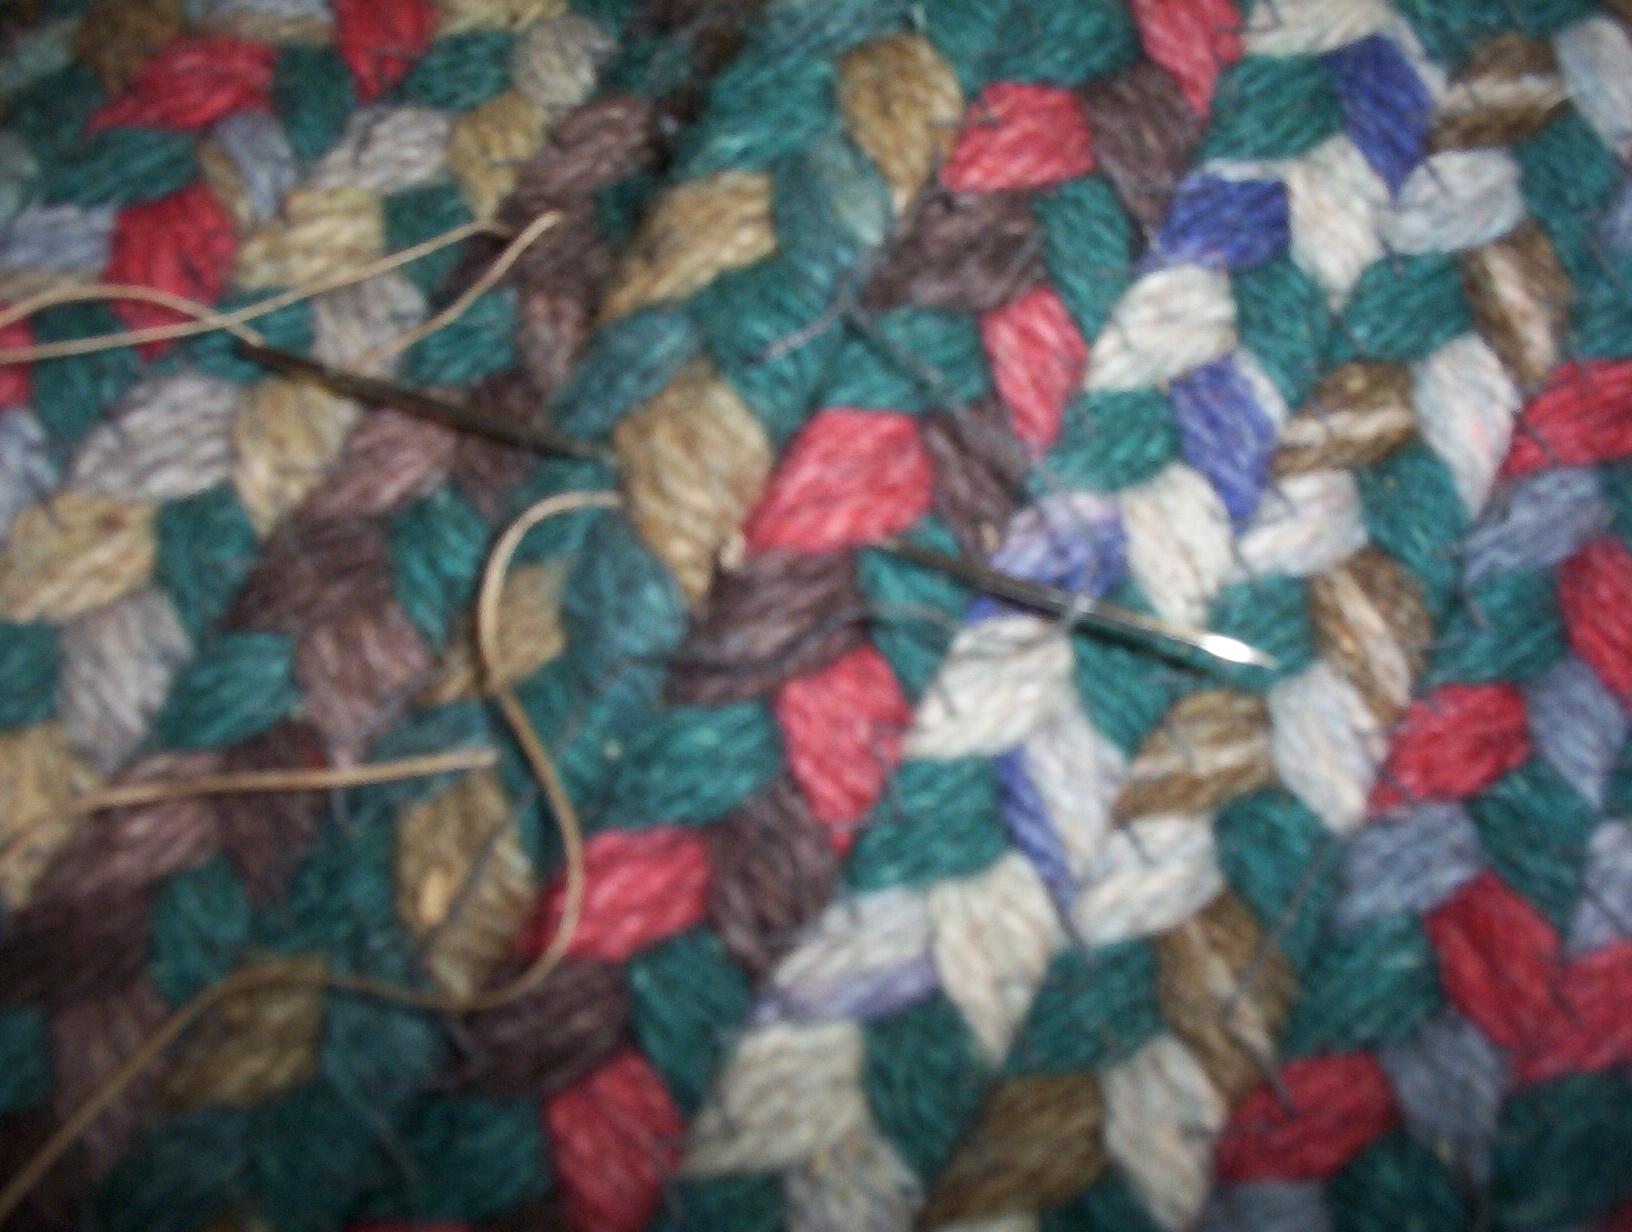 Braided Rug Repair